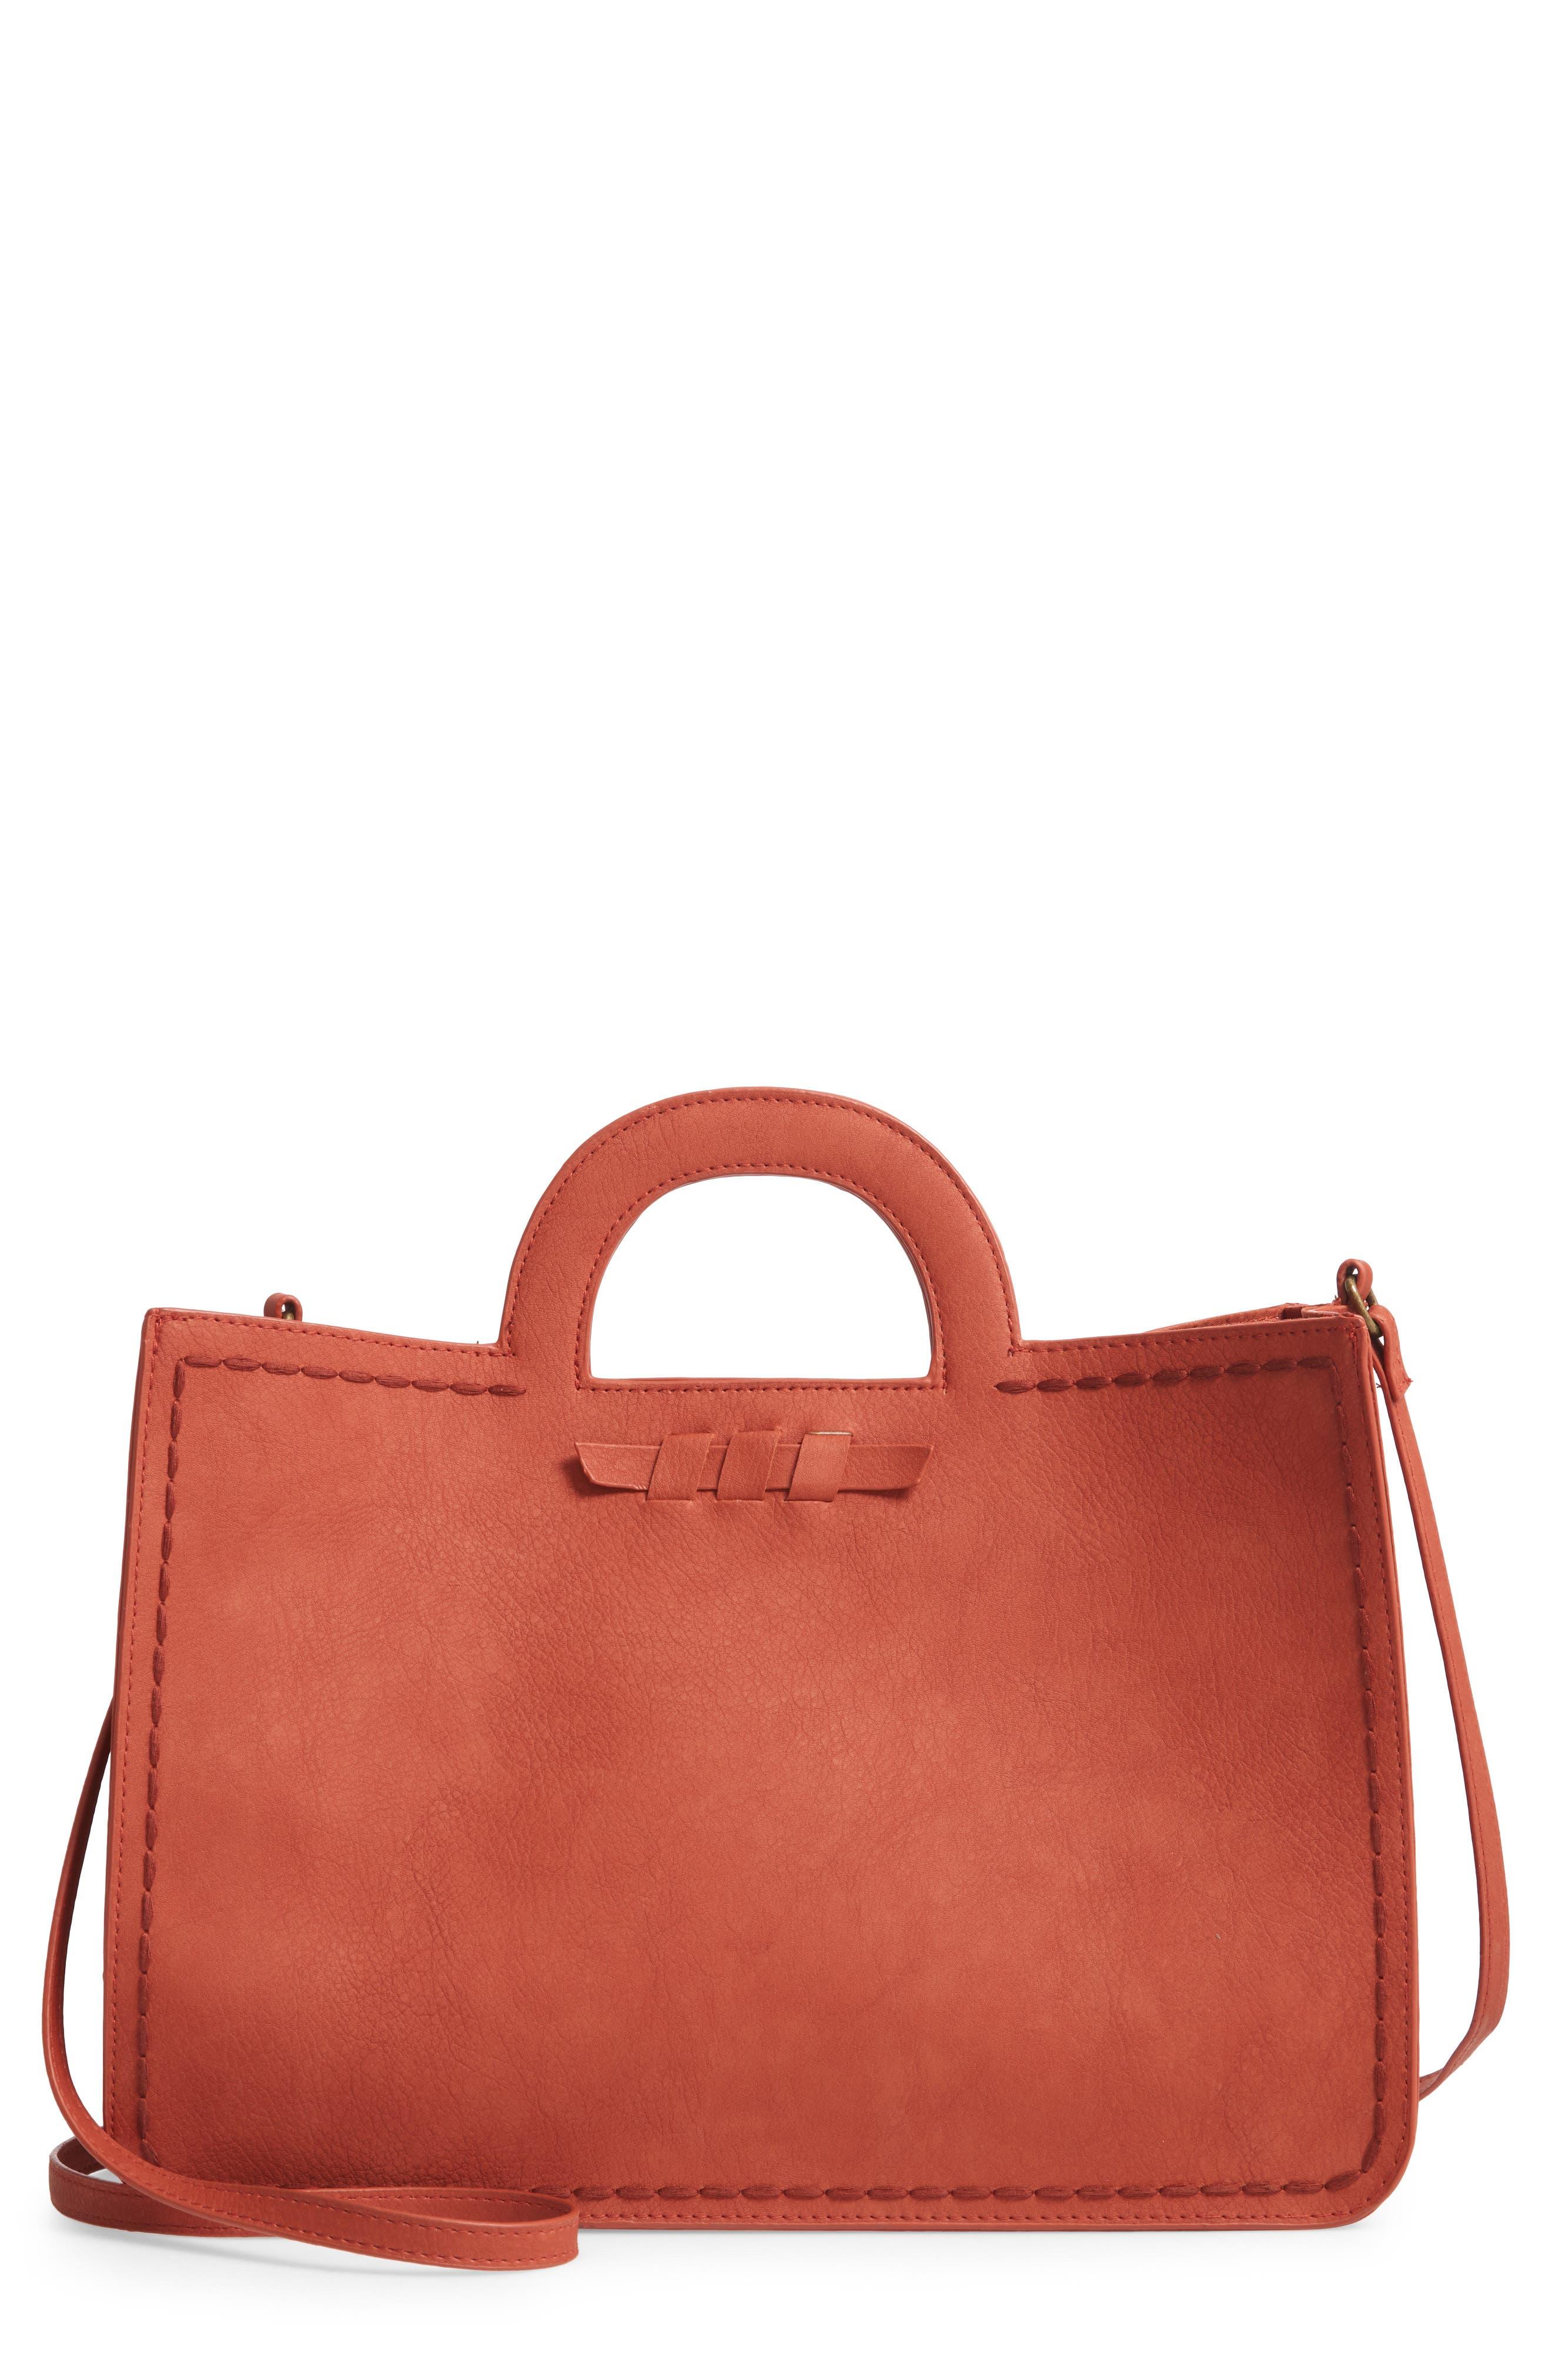 T-SHIRT & JEANS Faux Leather Top Handle Tote Bag, Main, color, 805